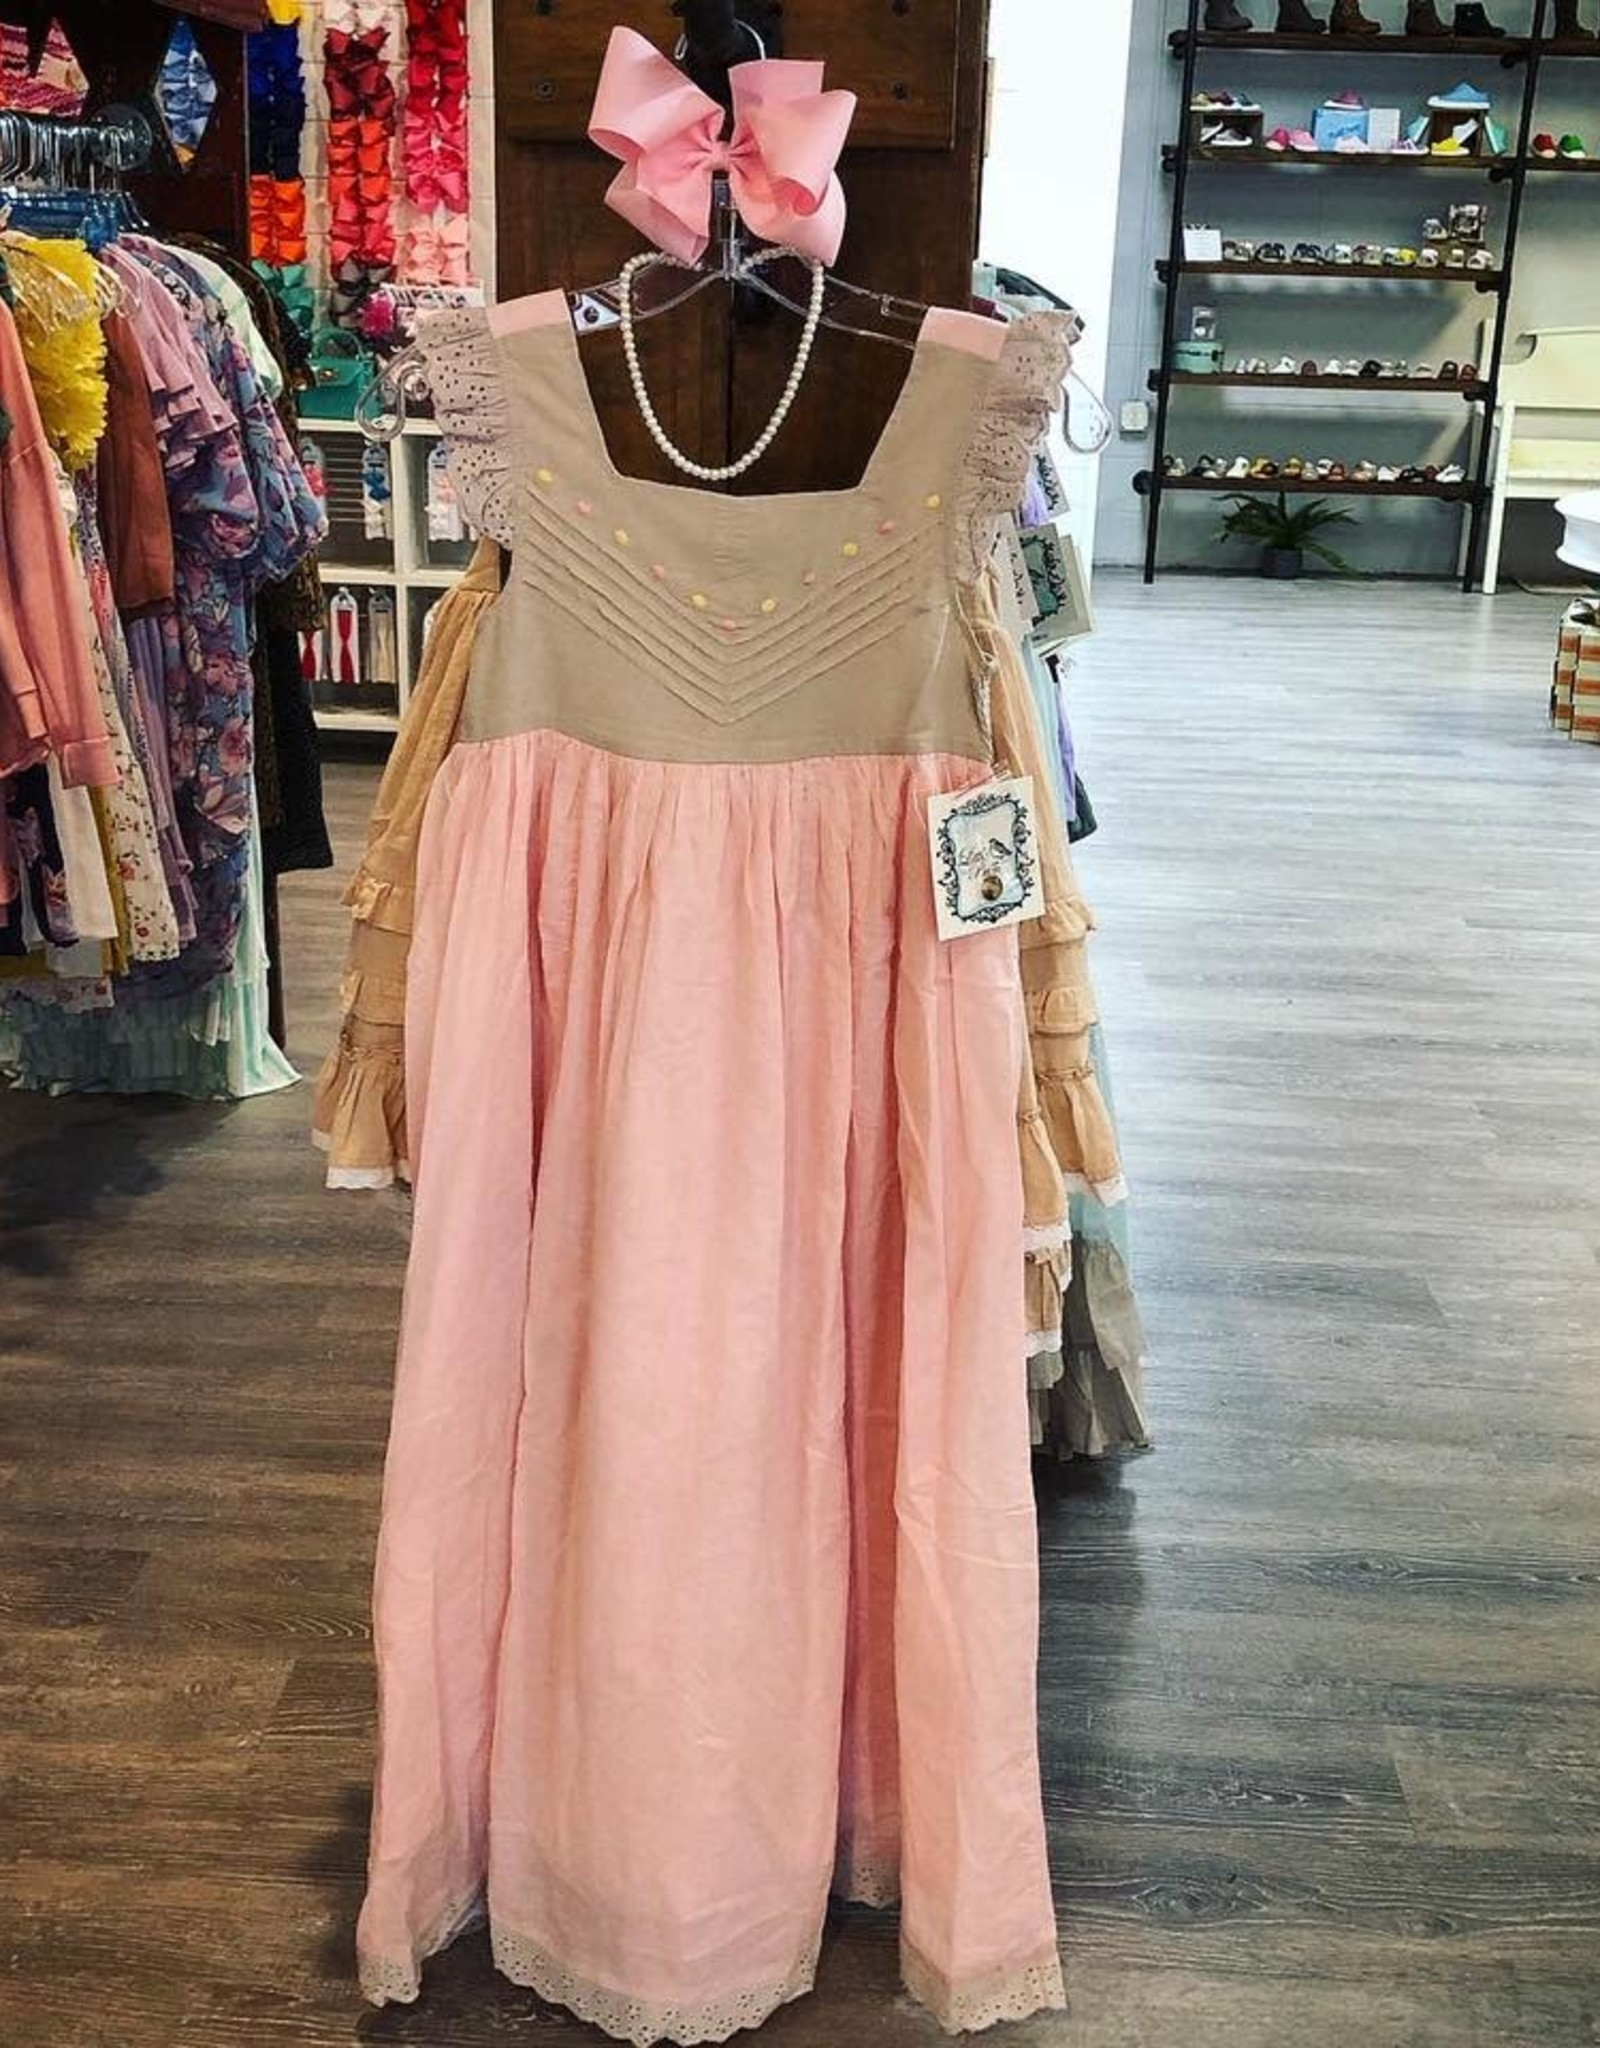 Little Prim Bubblegum Bisque Angelique Dress